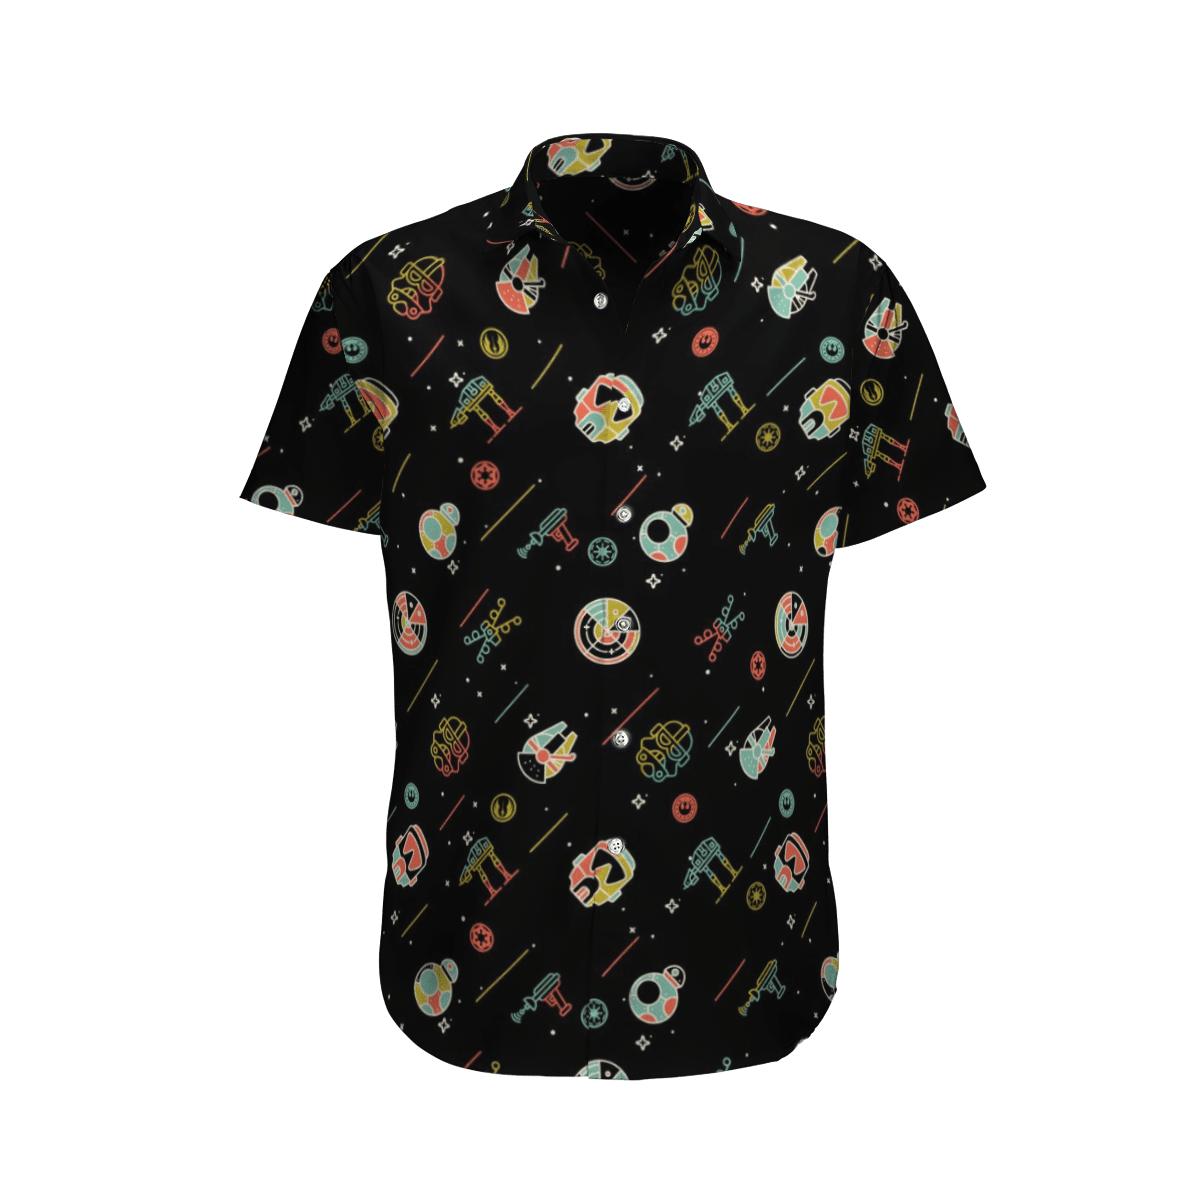 Star wars Small Animation Paradigm Hawaiian shirt